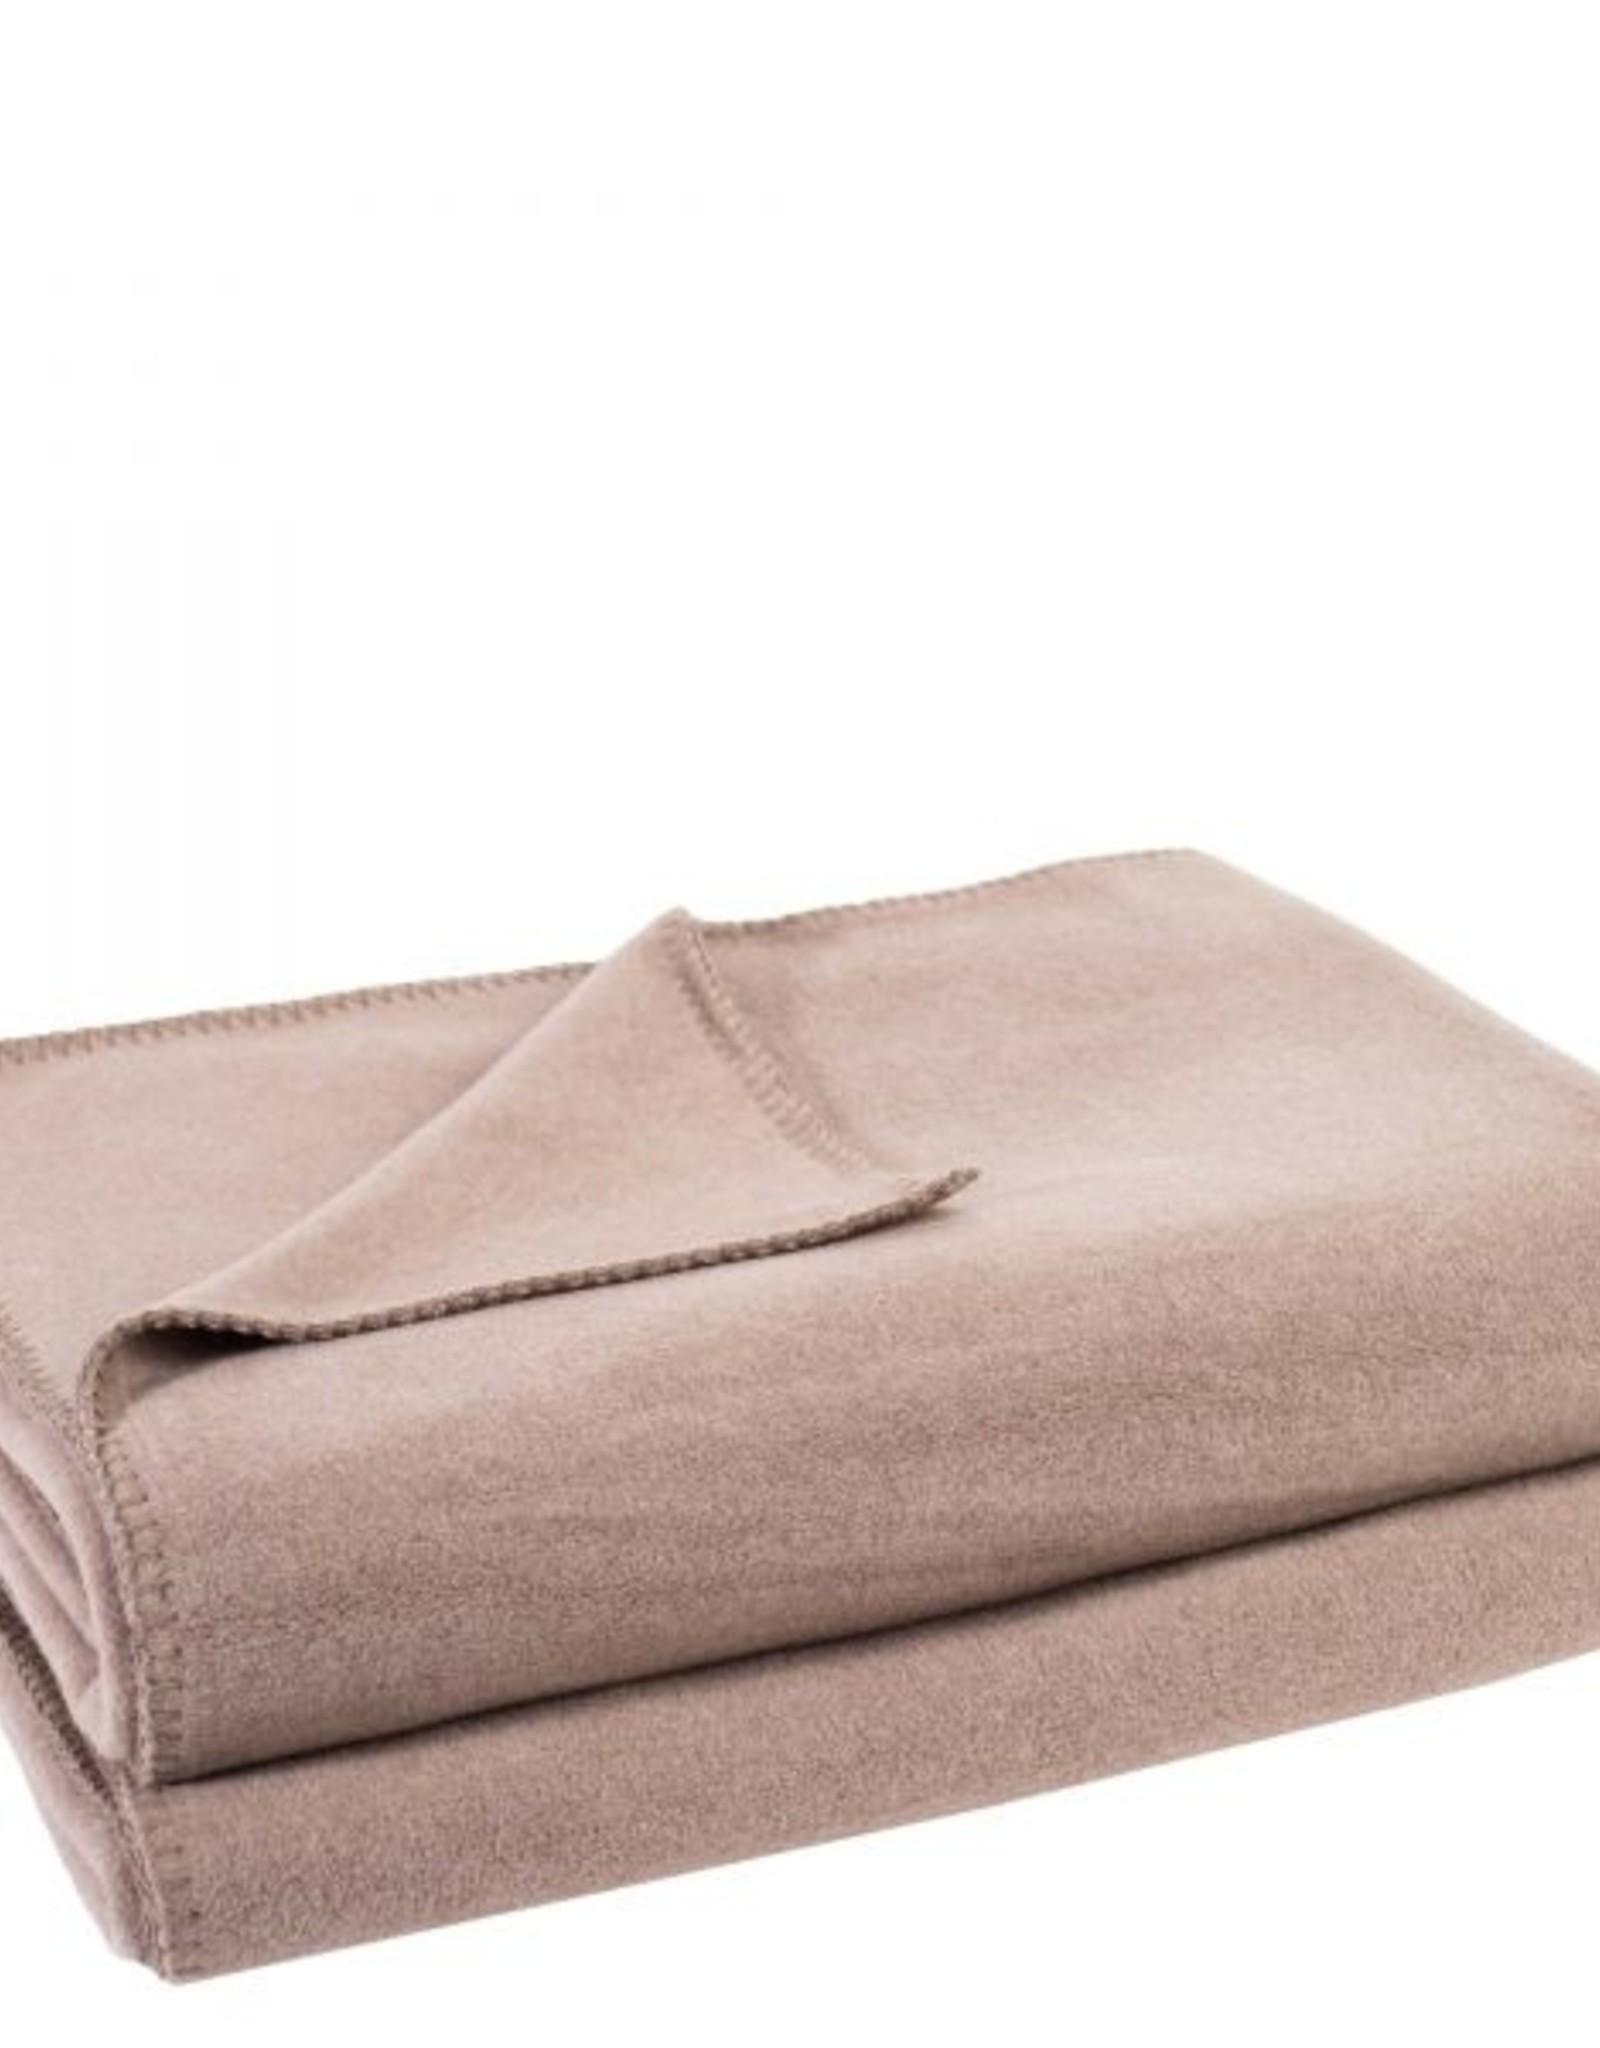 Zoeppritz Plaid Zoeppritz Soft Fleece,  Sand, kleur 40